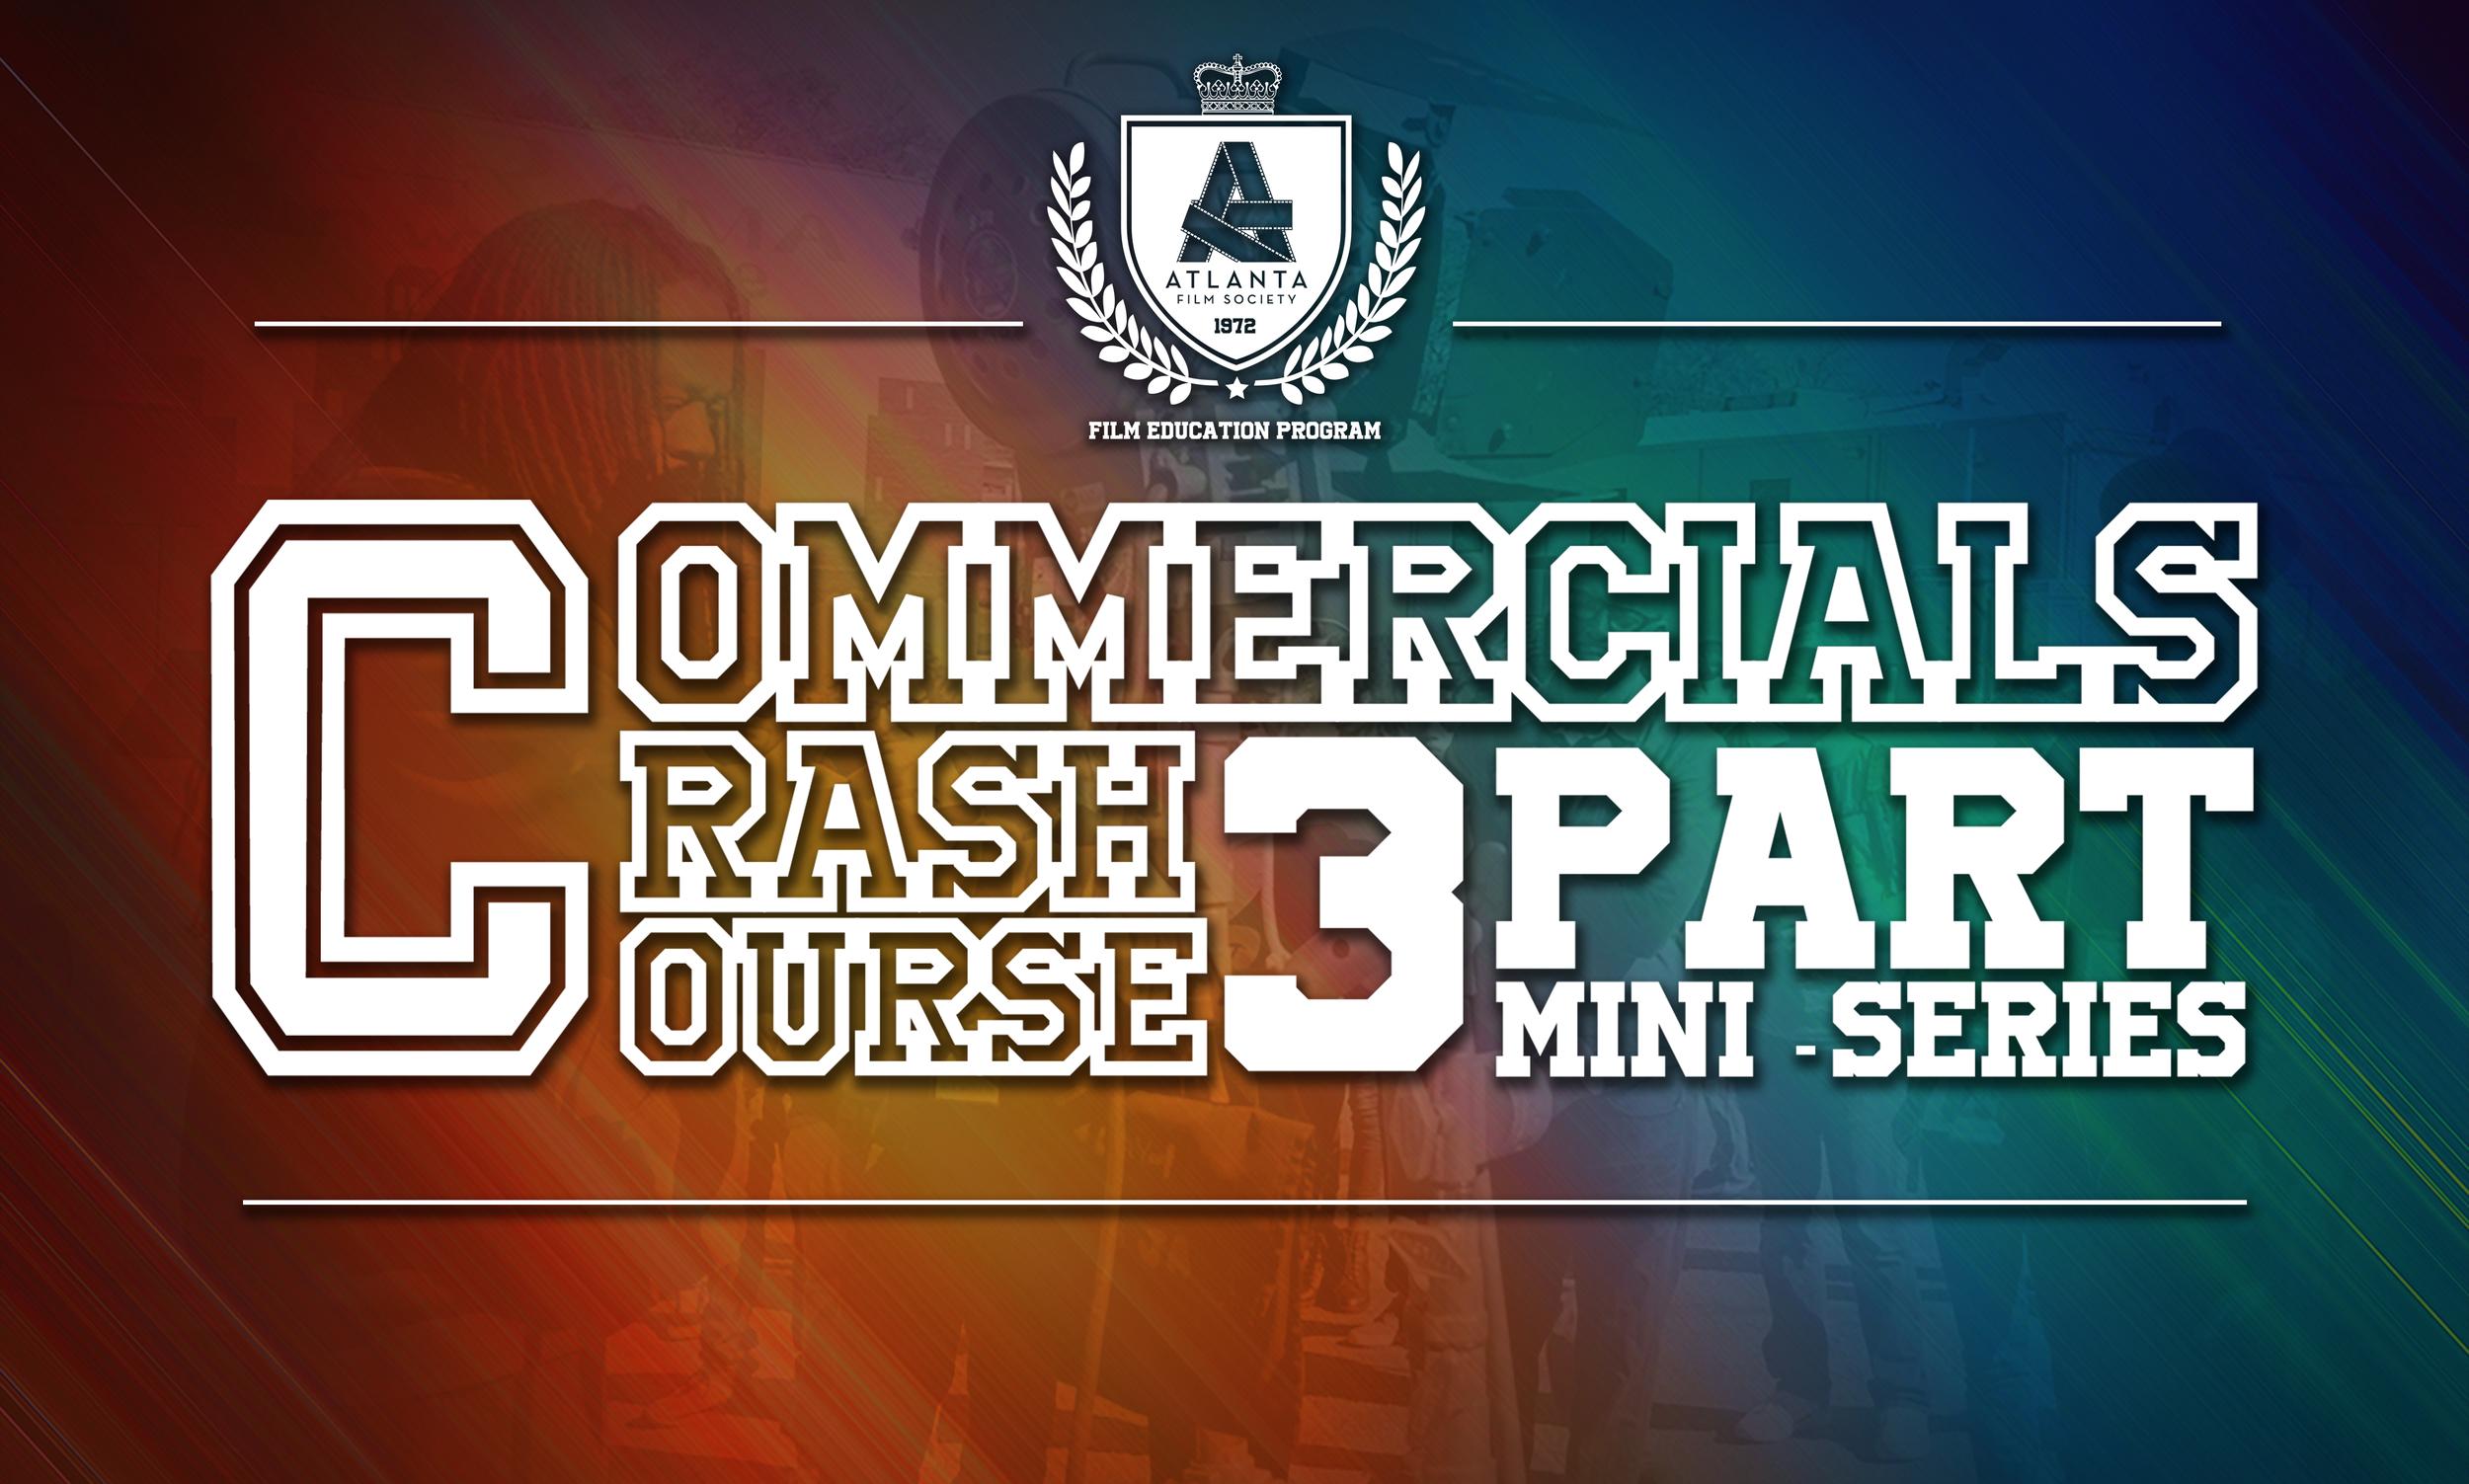 Commercials Crash Course Banner copy.png